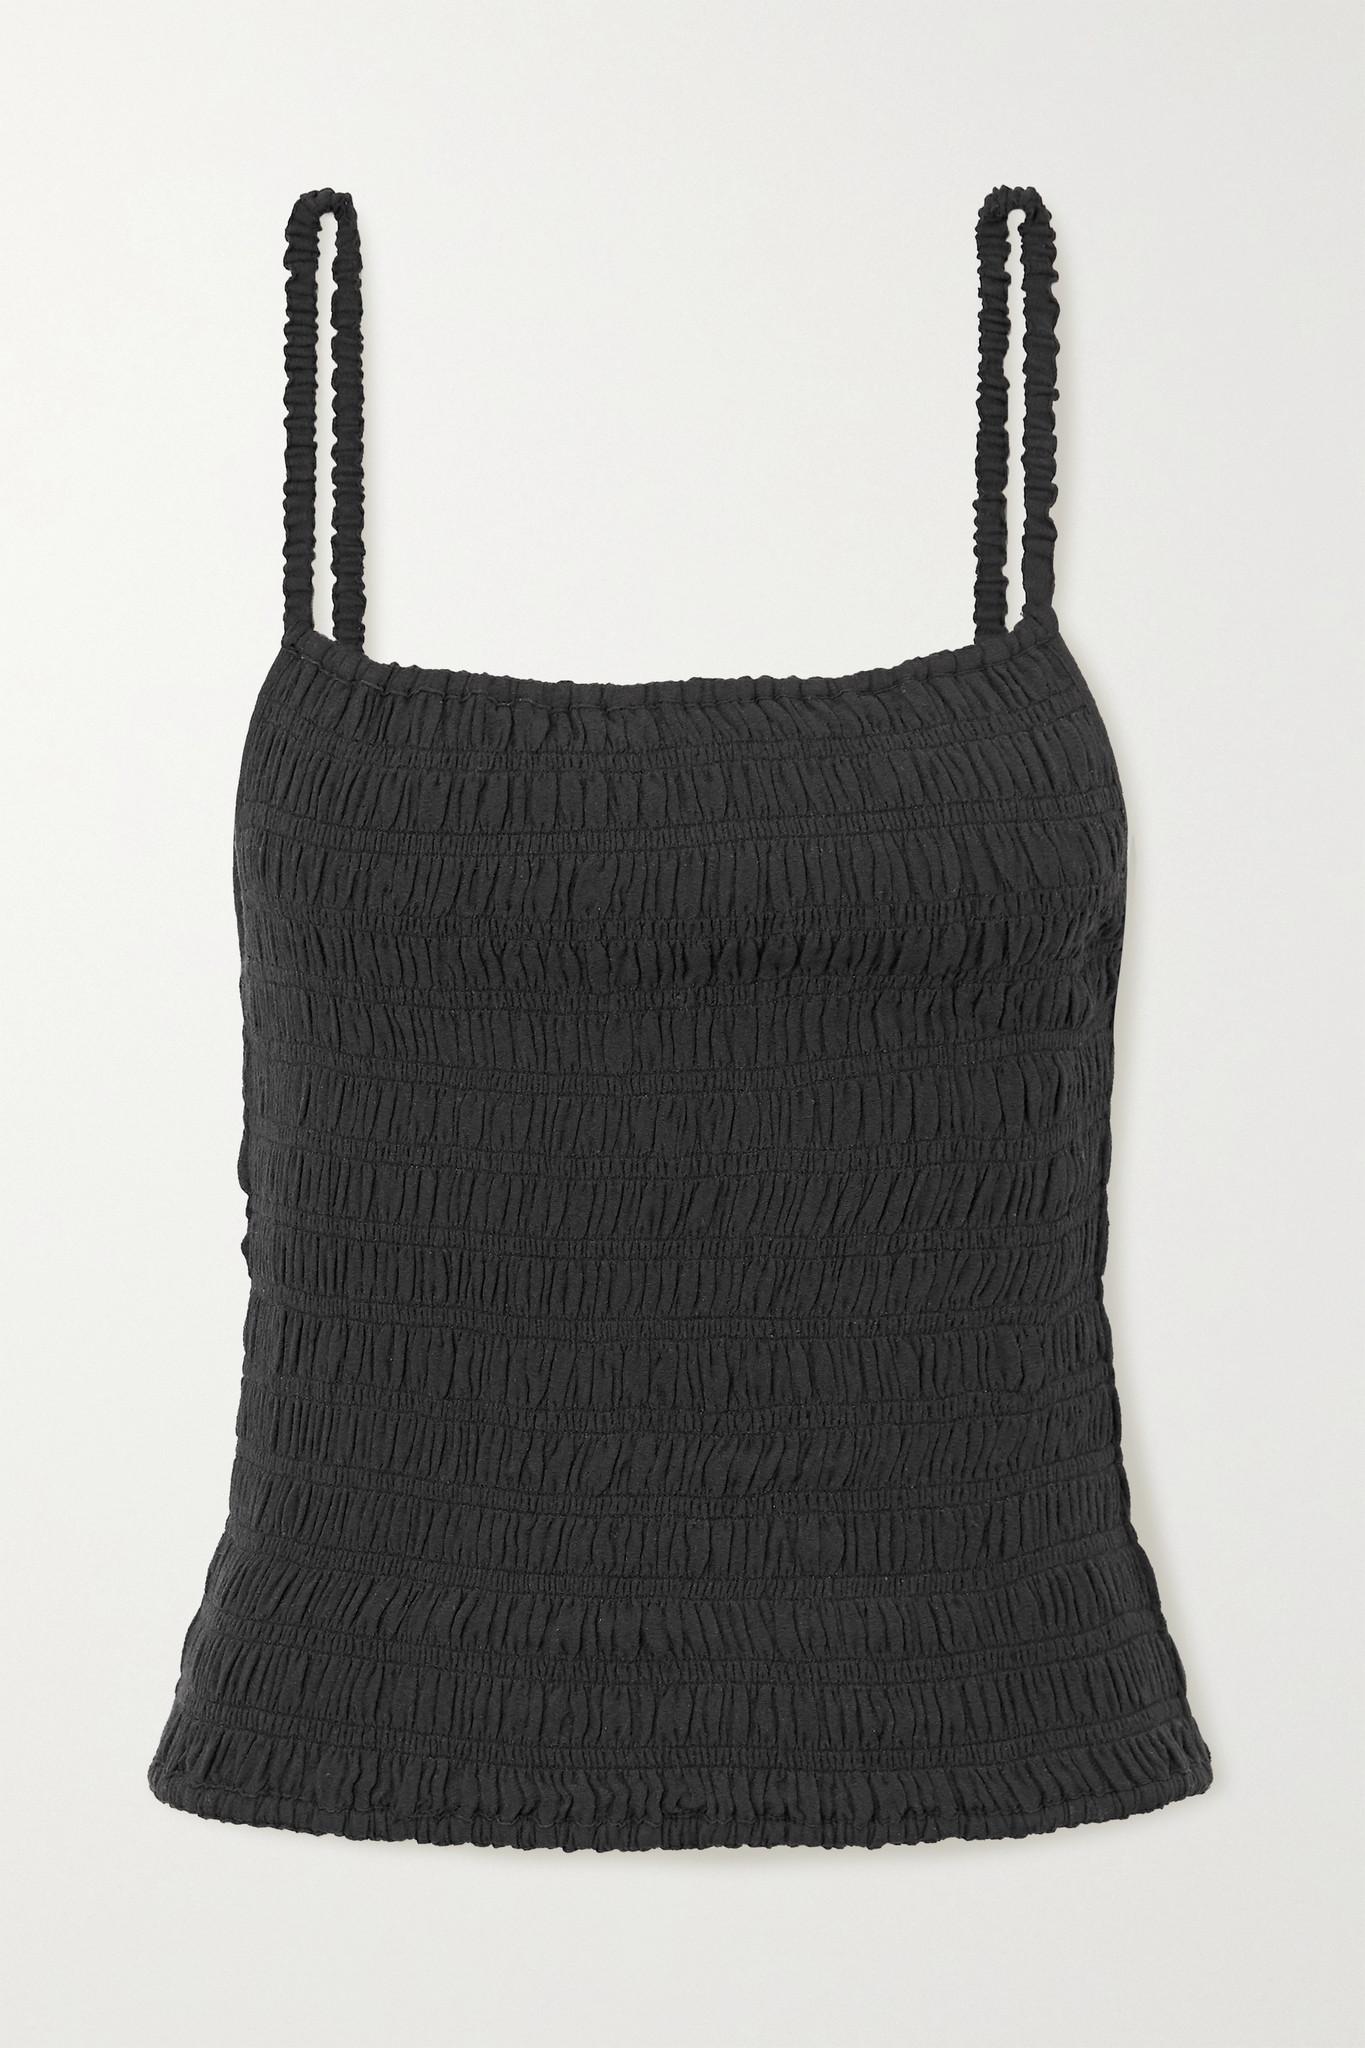 TOTÊME - 皱褶装饰梭织上衣 - 黑色 - DK34